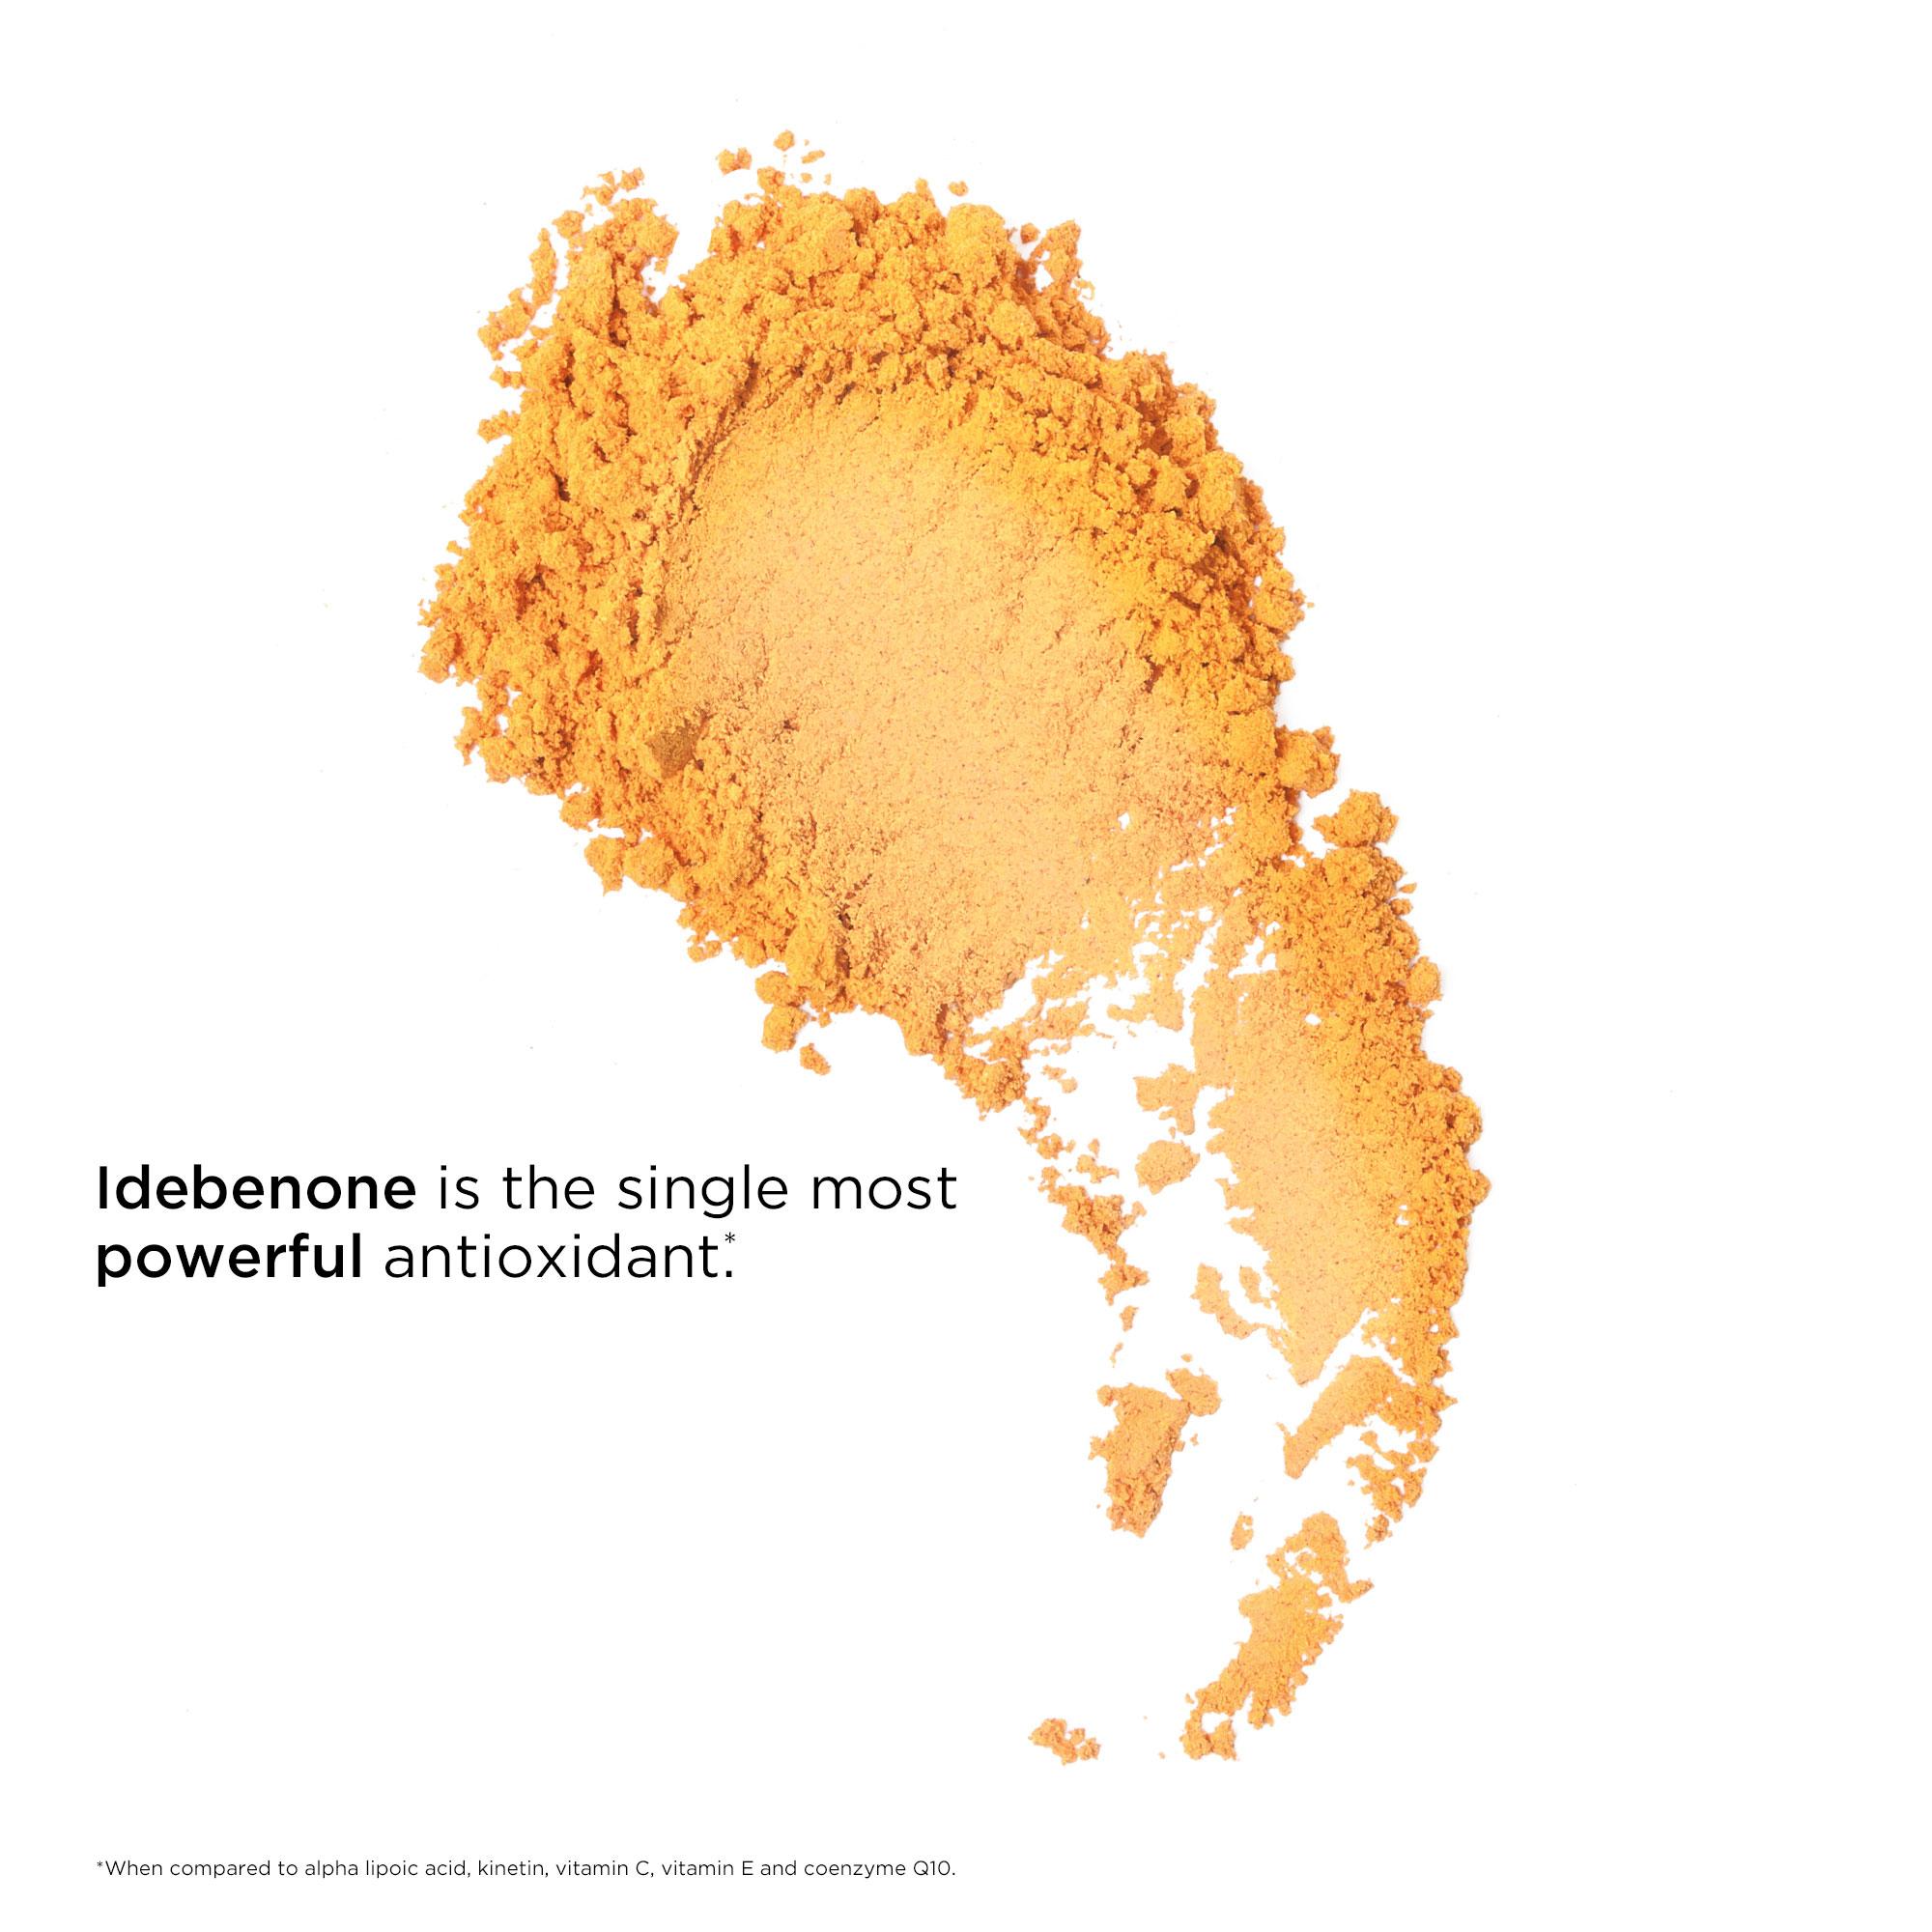 Idebenone is the single most powerful antioxidant when compared to alpha lipoic acid, kinetin, Vitamin c, vitamin e, and coenzyme Q10.